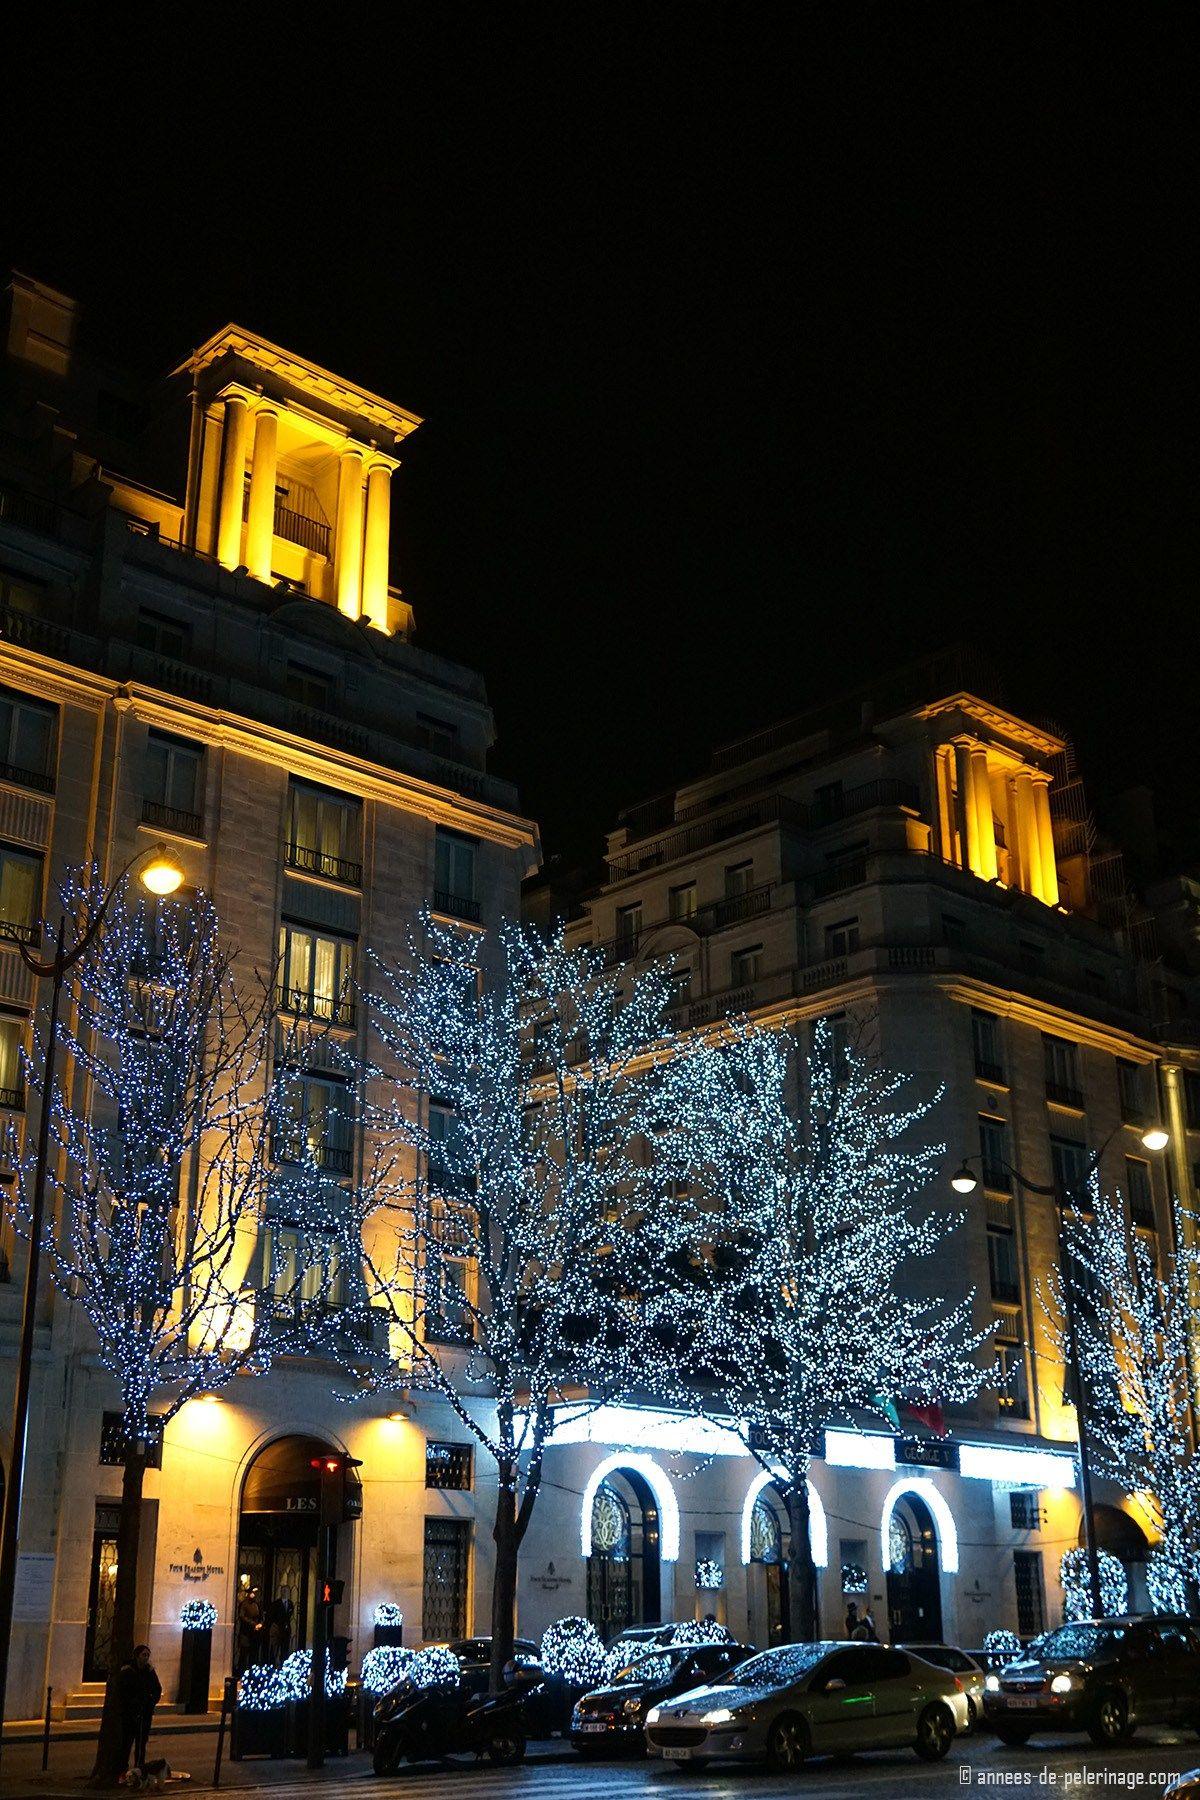 Paris Best Luxury Hotel: The George V